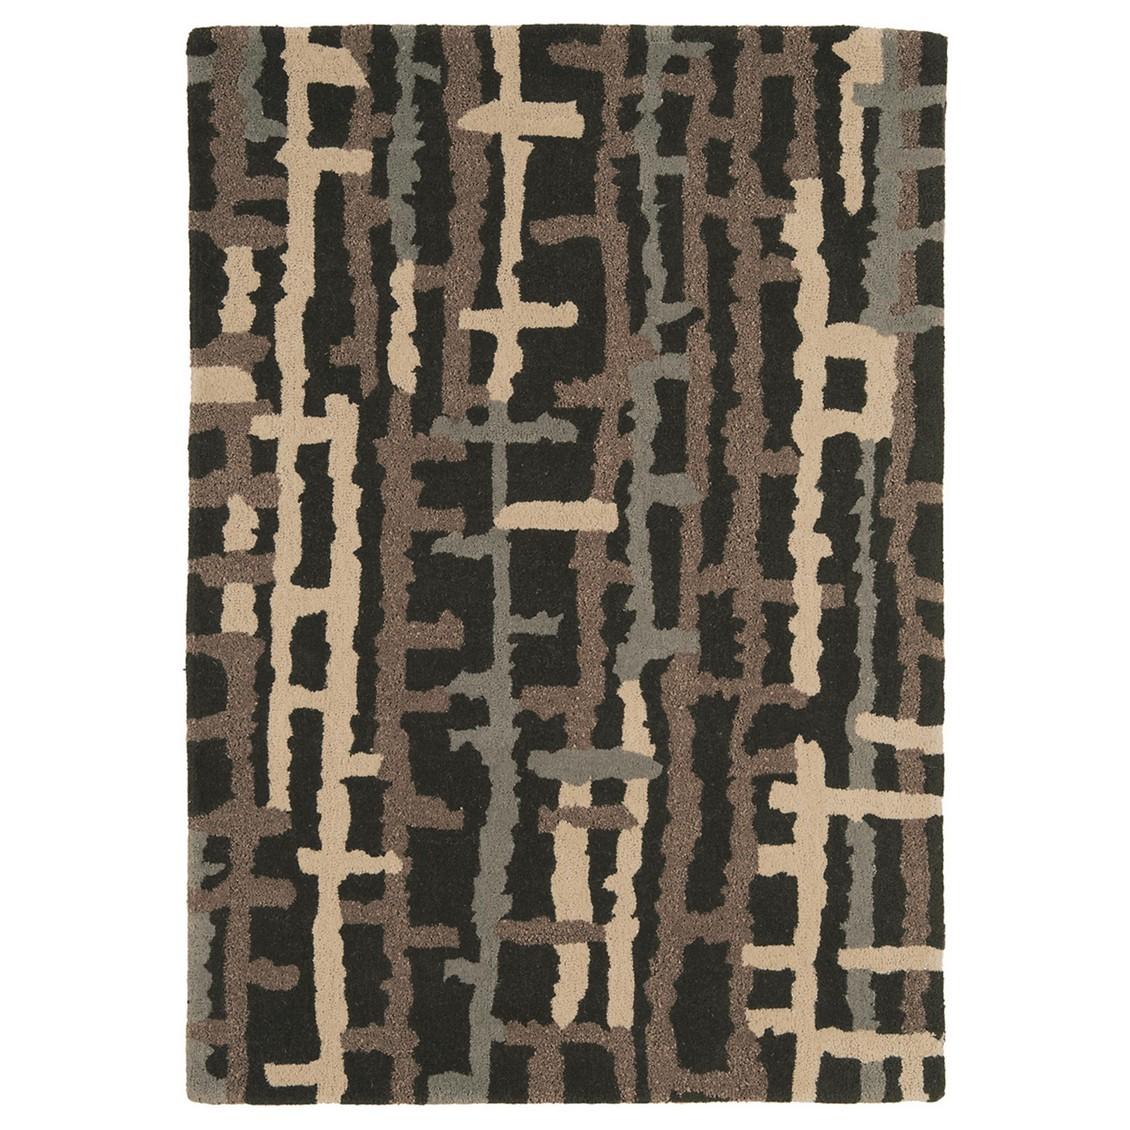 teppich matrix ripley braun 160 x 230 cm benuta jetzt bestellen. Black Bedroom Furniture Sets. Home Design Ideas